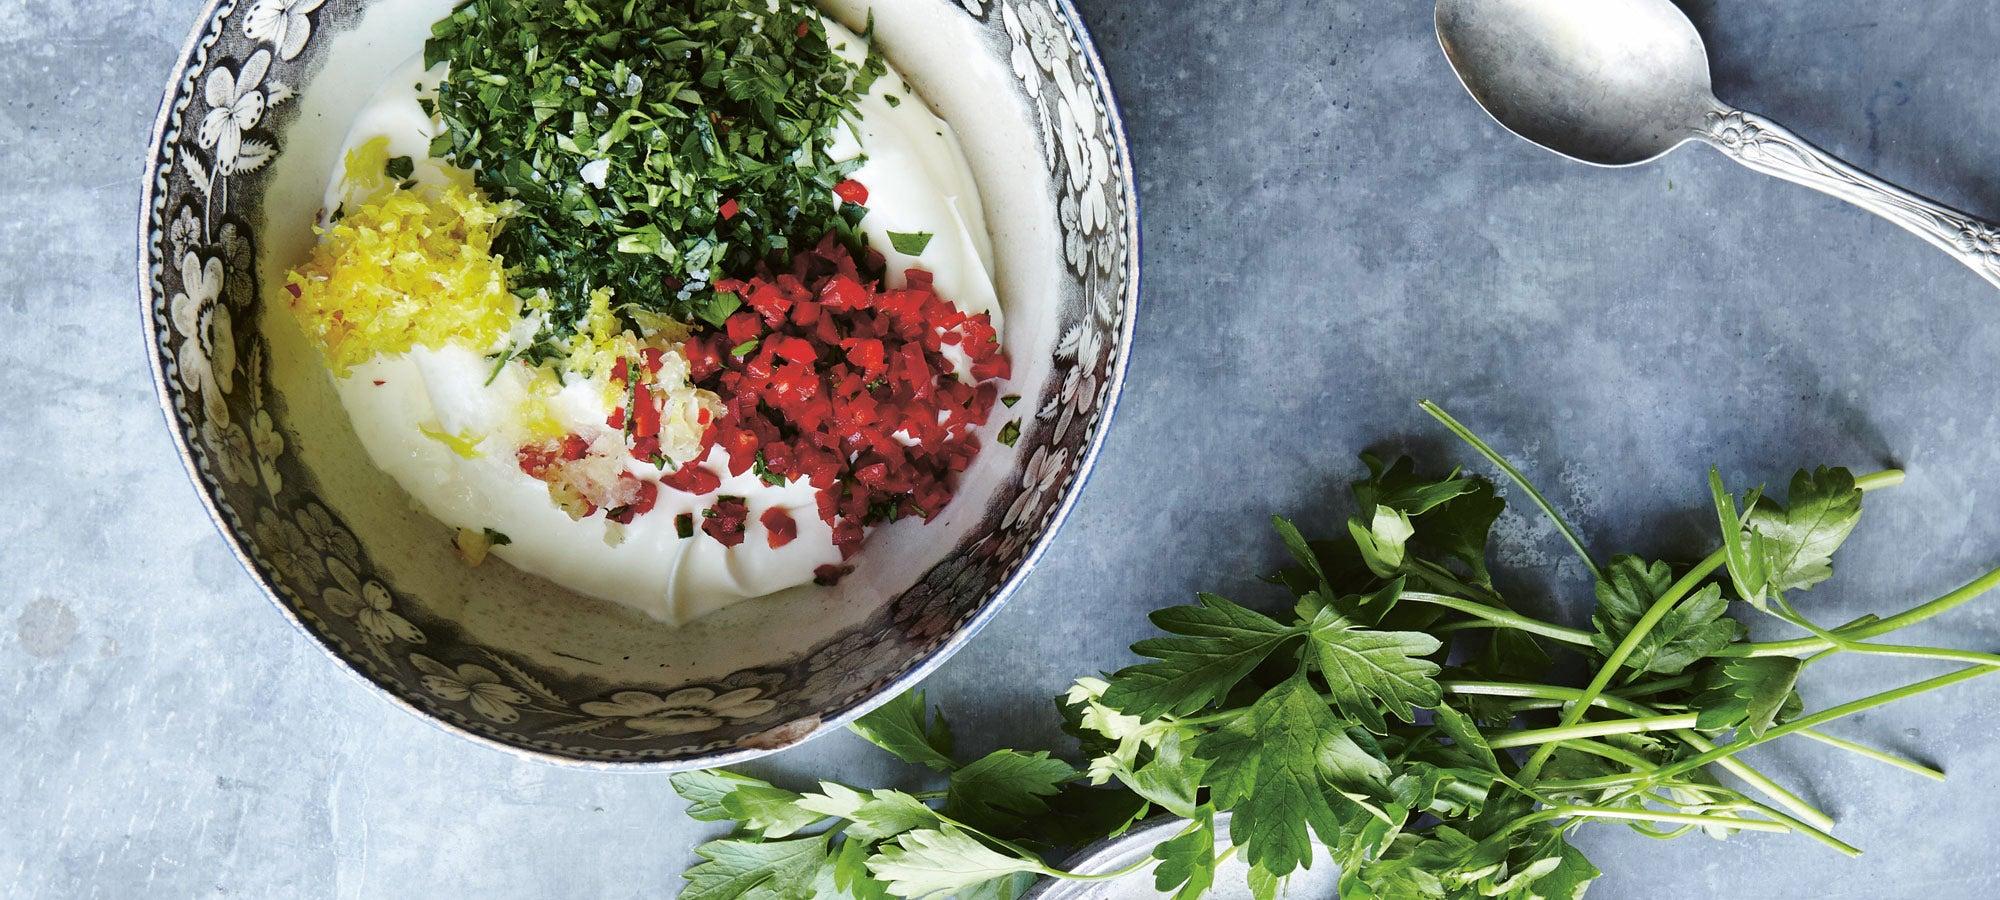 Julia Turshen's Secrets To Better Home Cooking